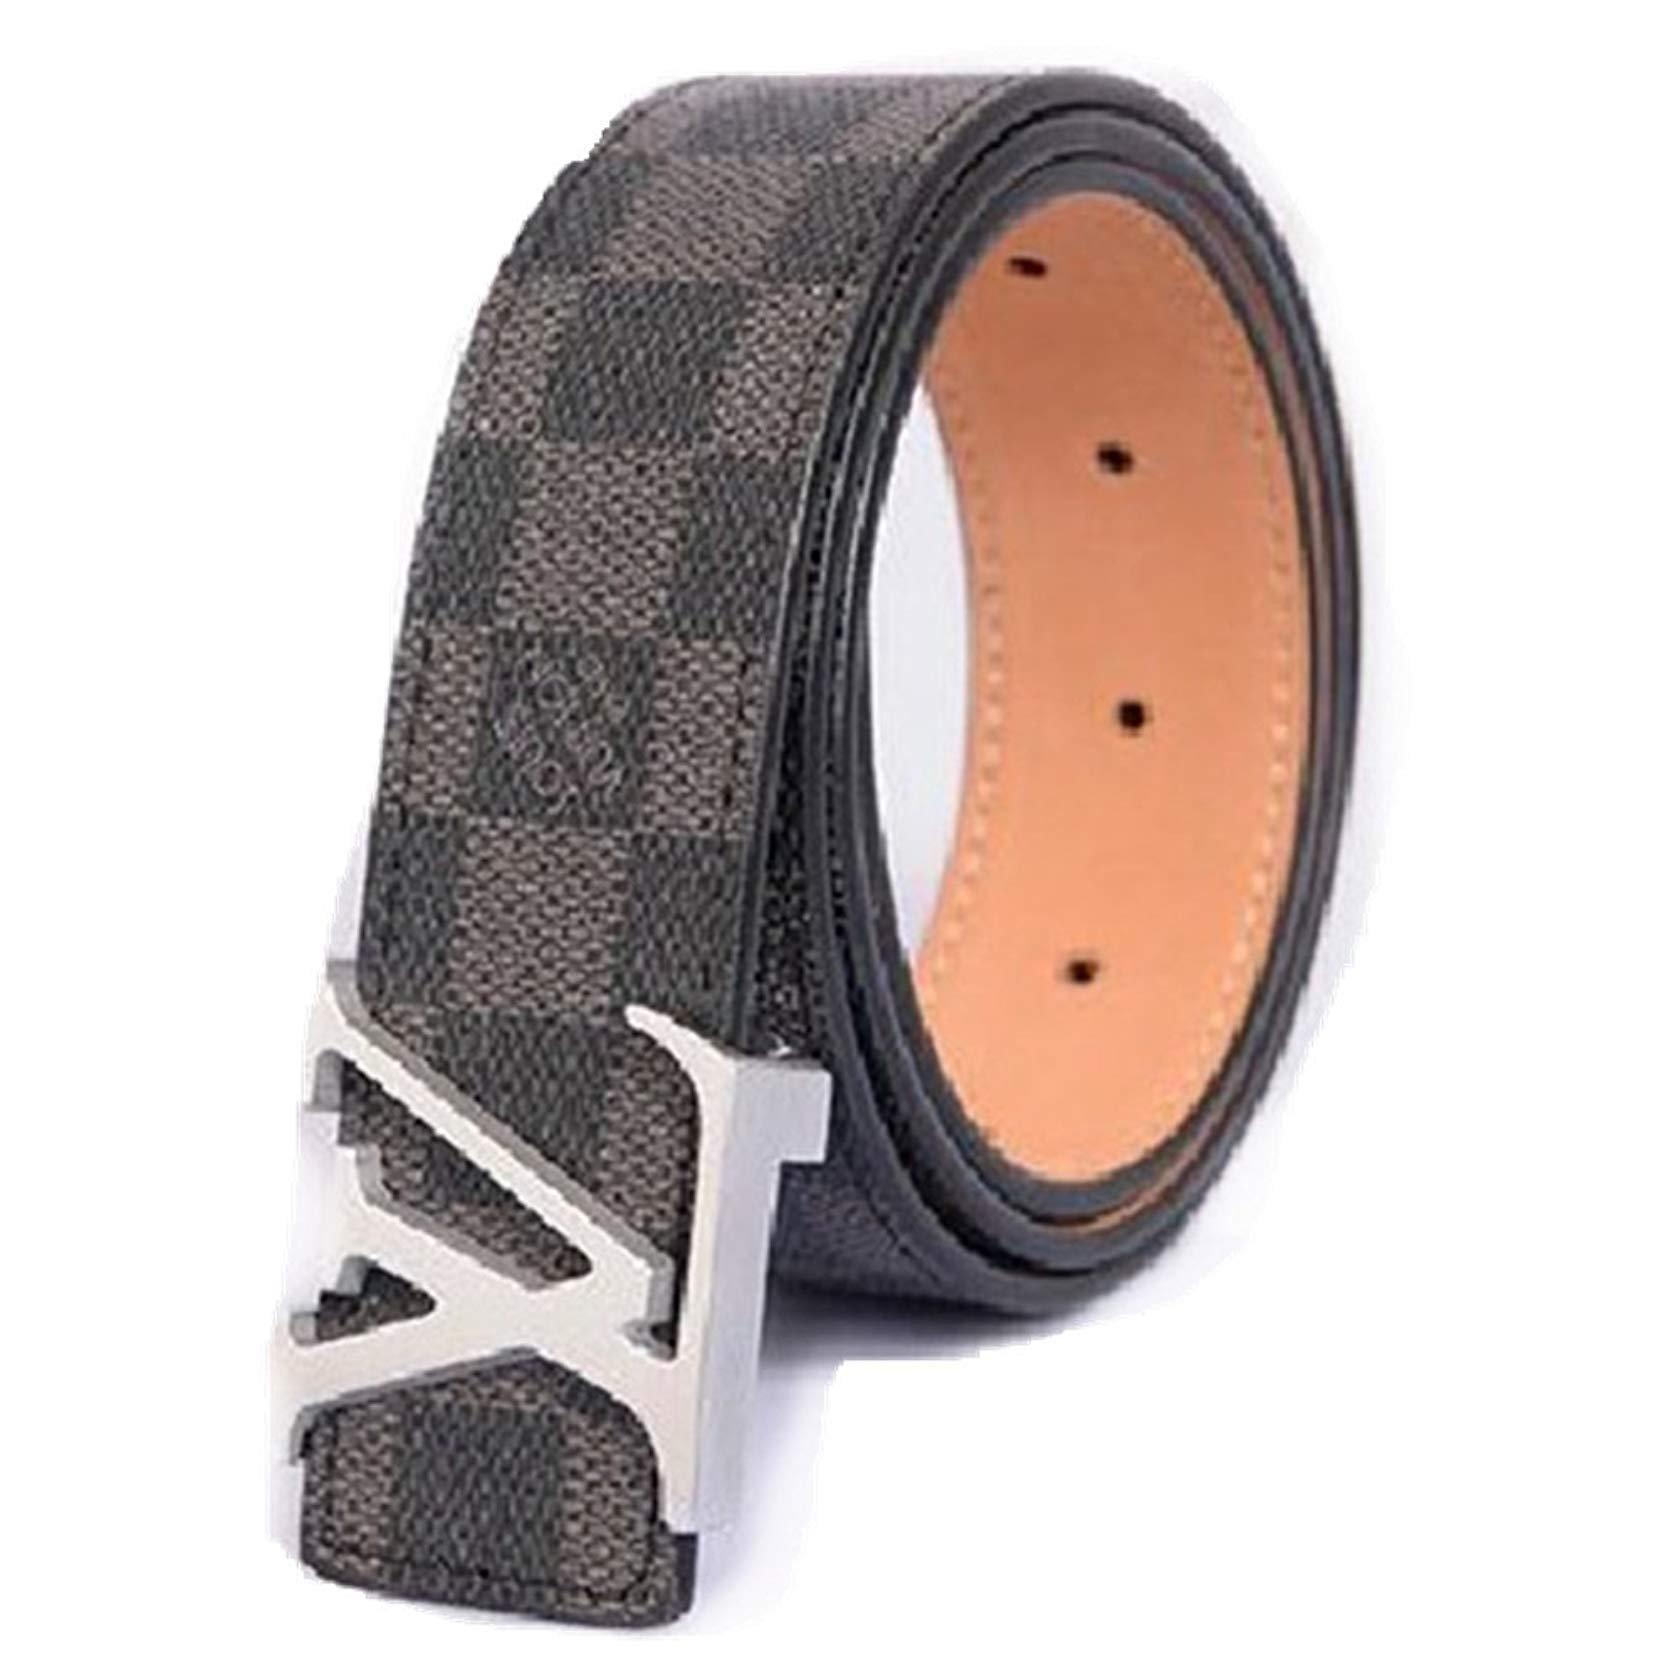 Fashion Black leather belt with Silver belt buckle